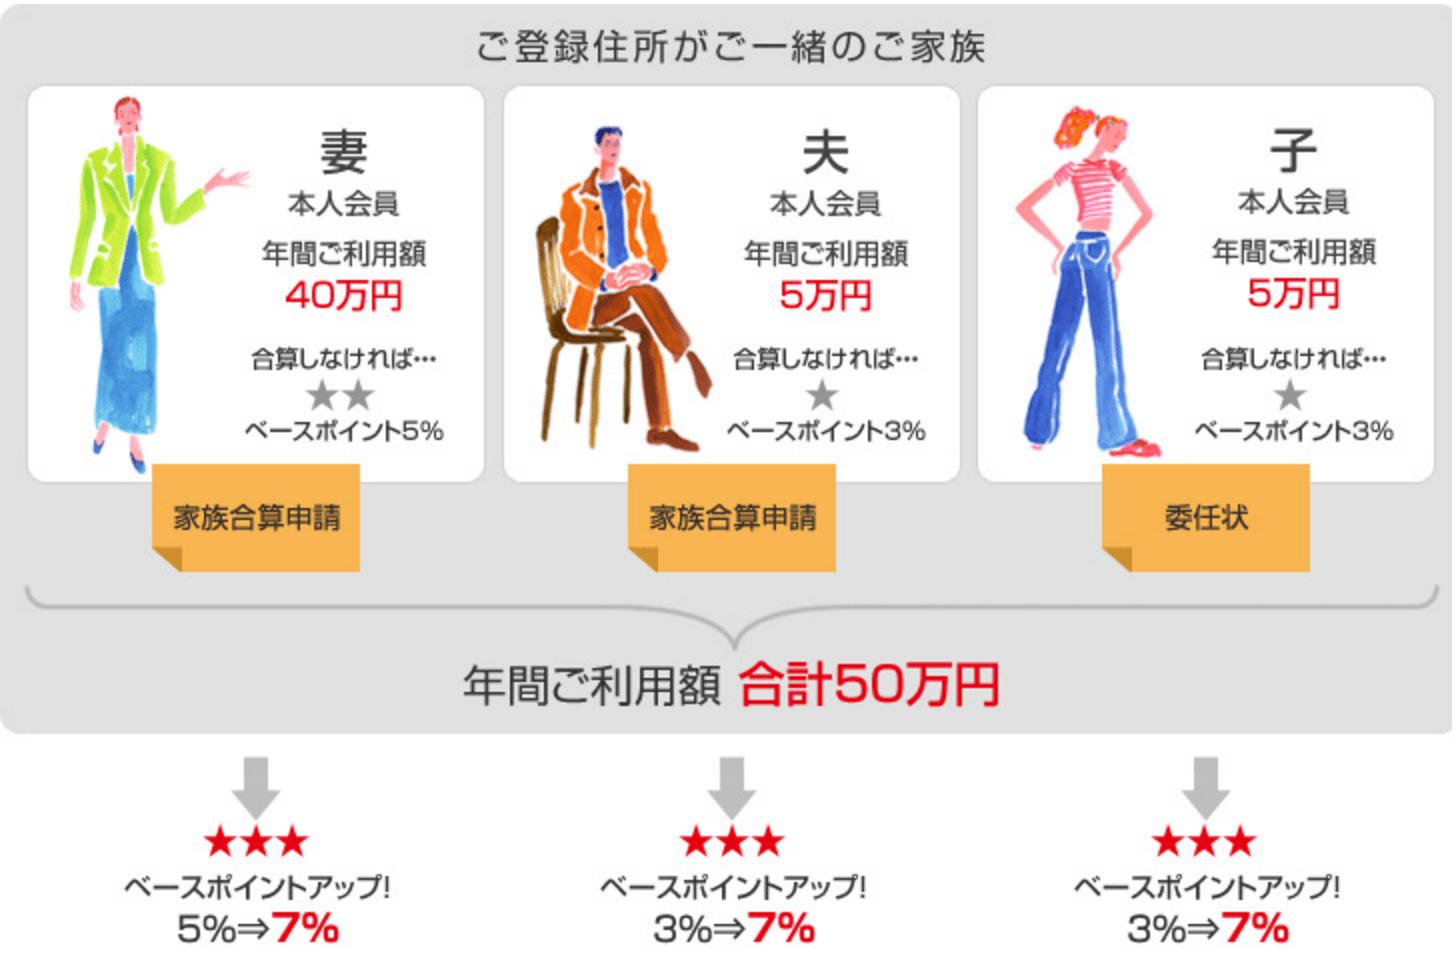 JALカードTOKYU POINT ClubQ CLUB-Aゴールド 東急百貨店 家族合算サービス